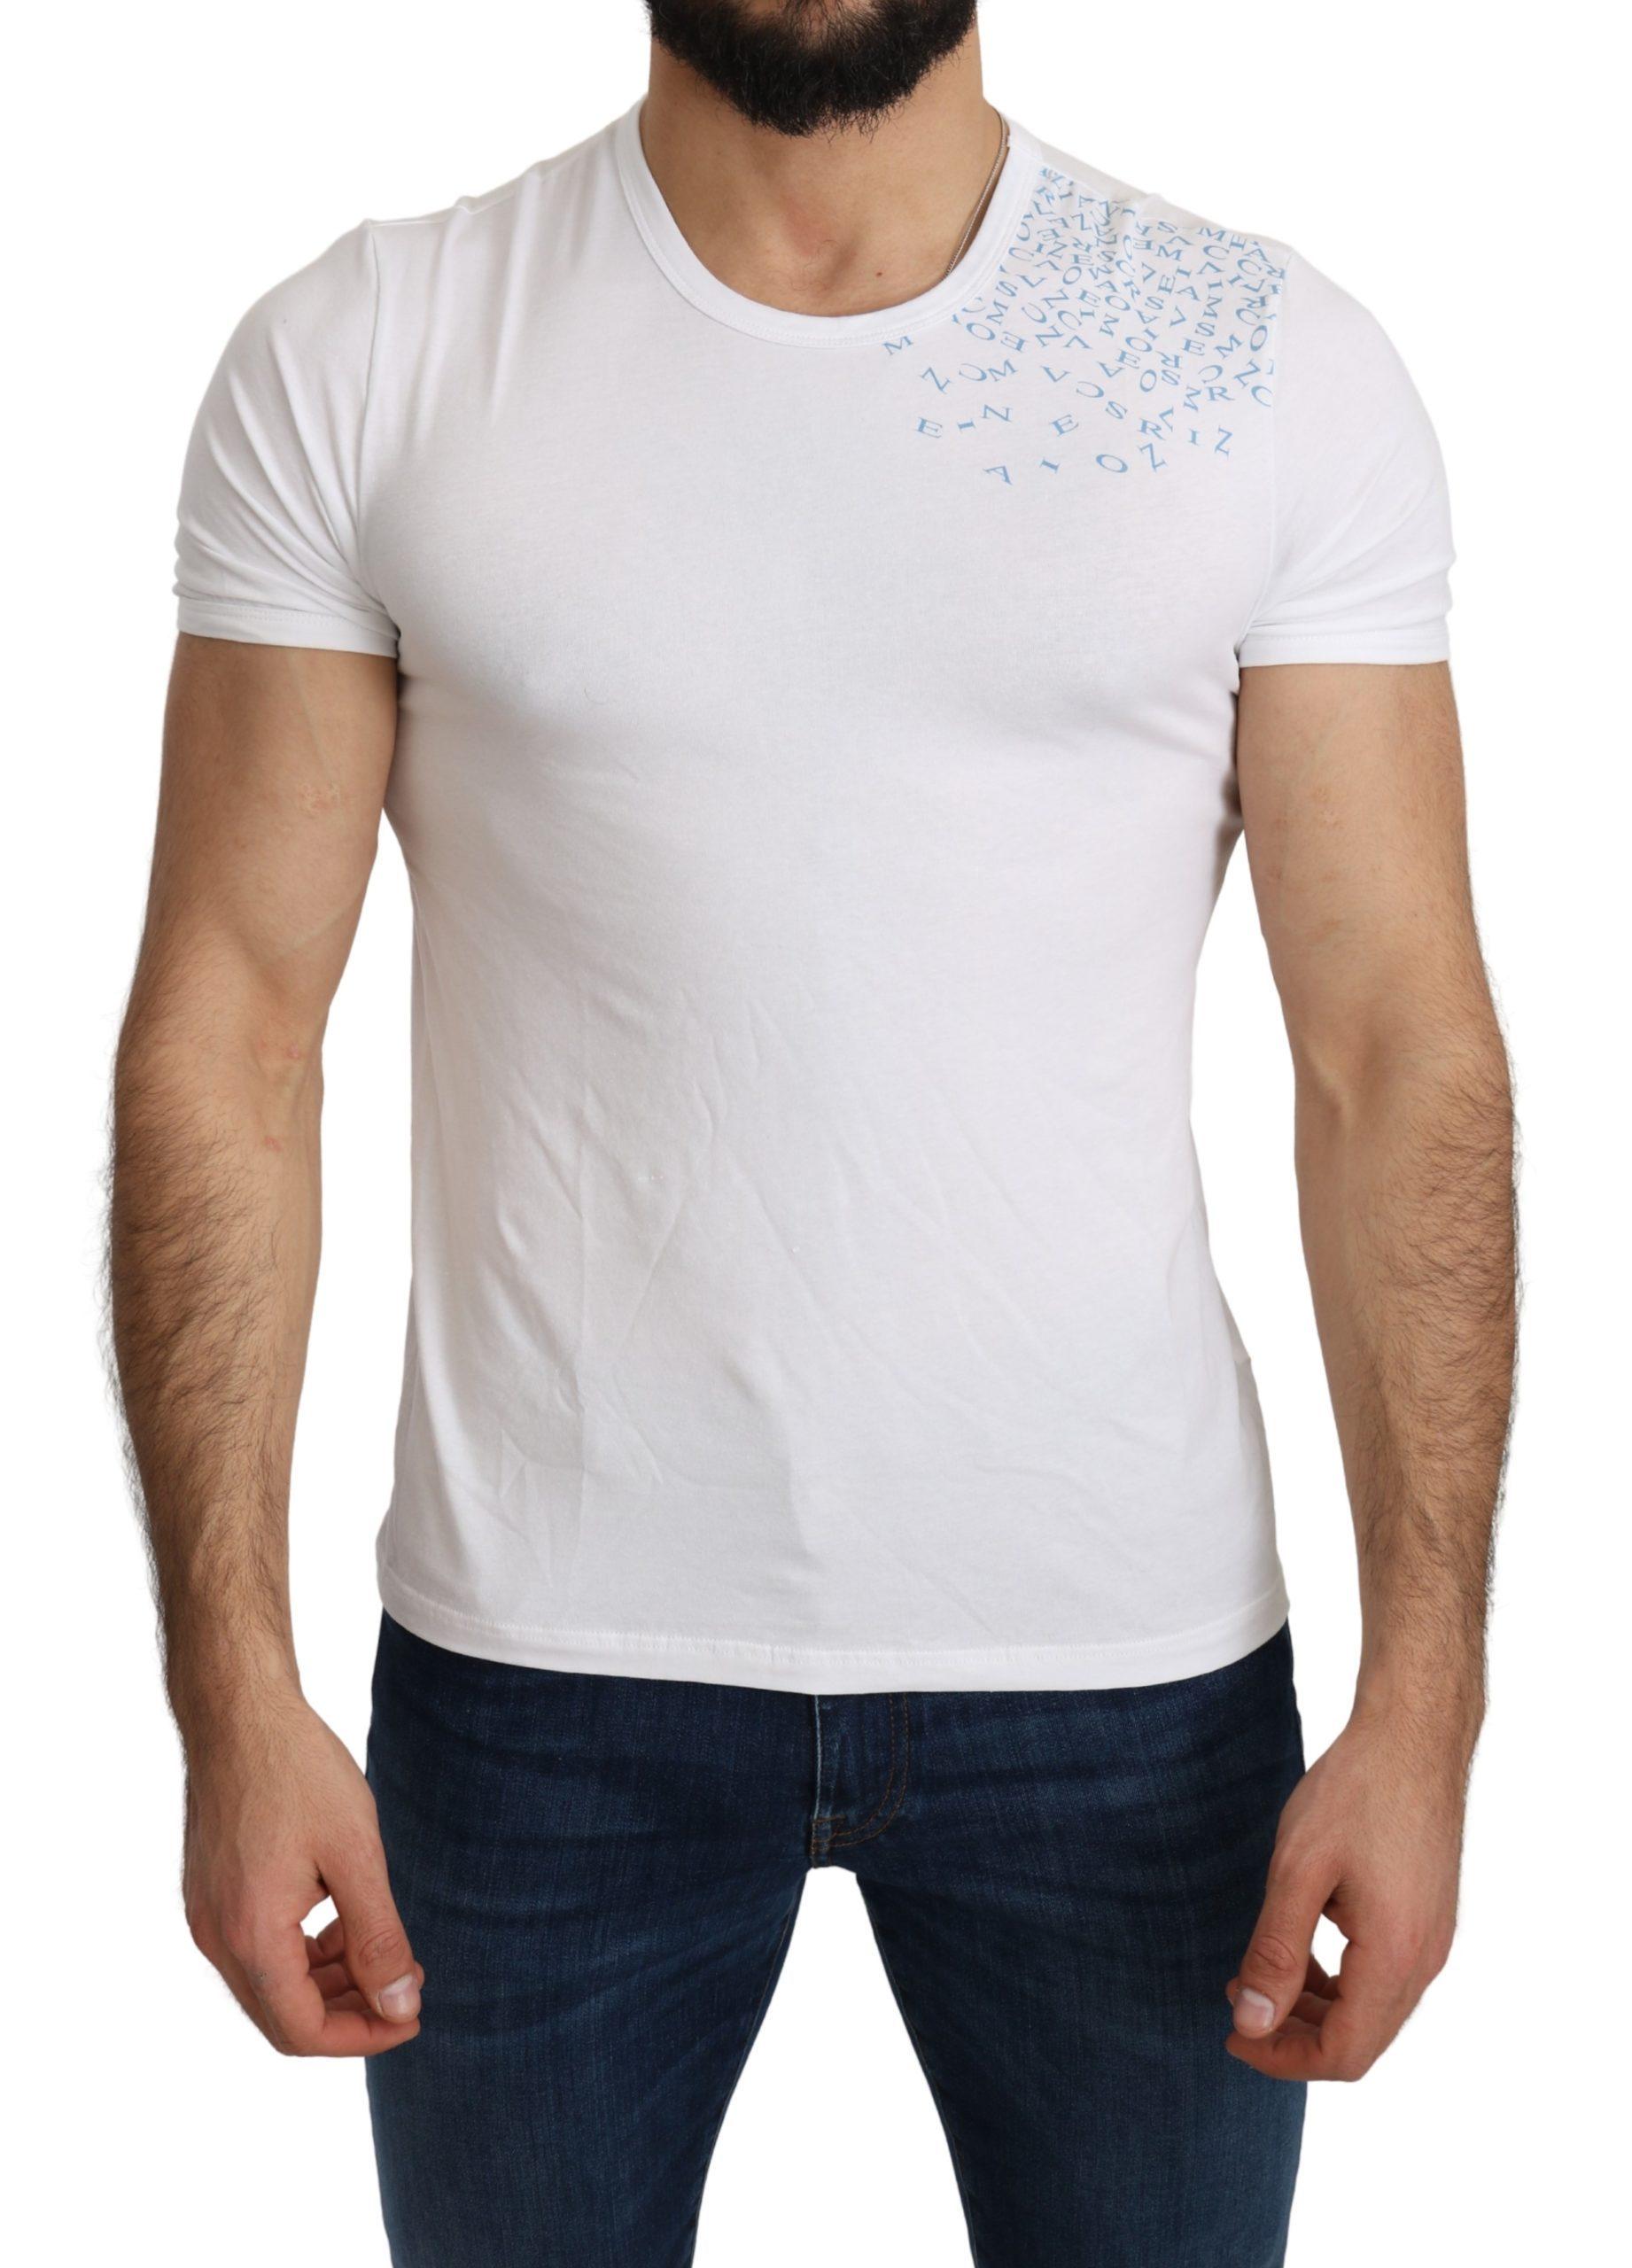 Ermanno Scervino Men's Cotton Stretch Beachwear T-shirt White TSH5181 - IT48 | M